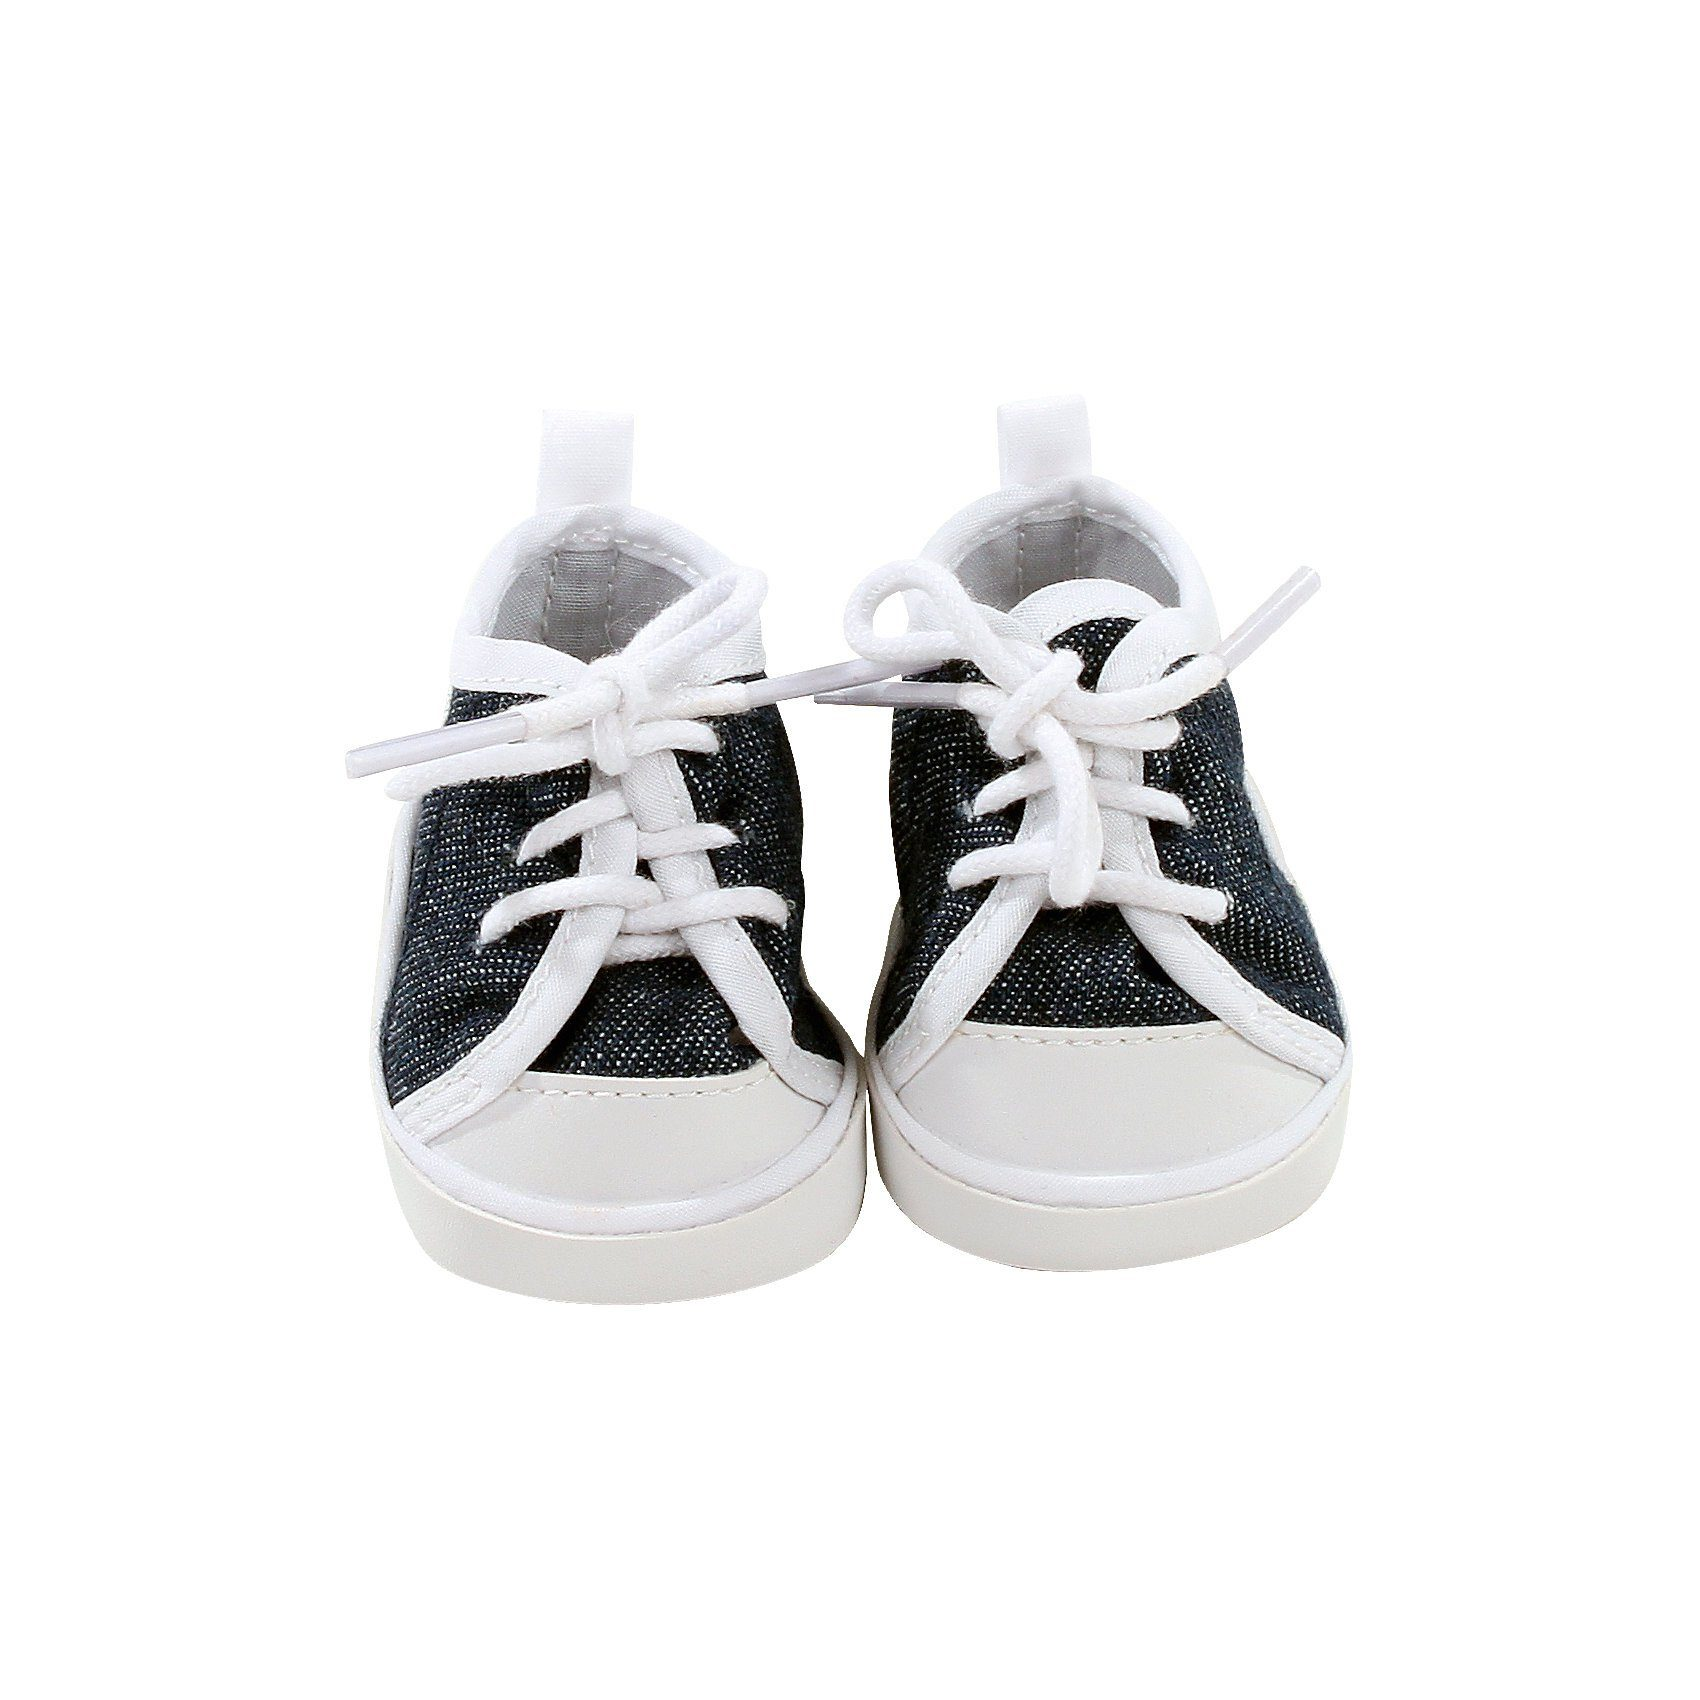 Götz Puppenkleidung Schuhe, sneaker denim, 42 cm - 50 cm